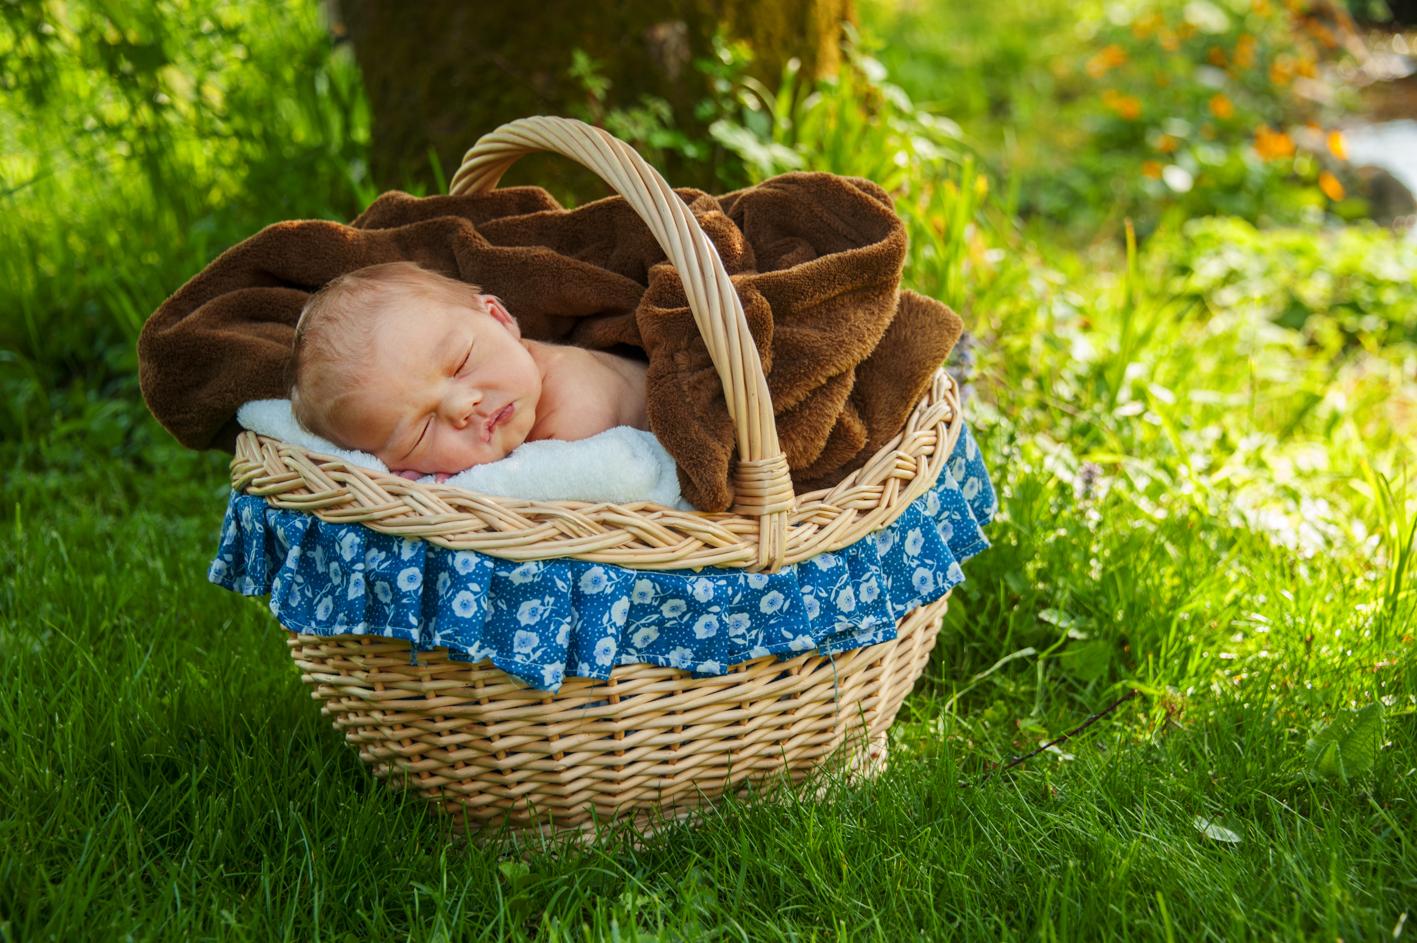 Neugeborenenfotografie, ©Carmen Weder, Art of Moment